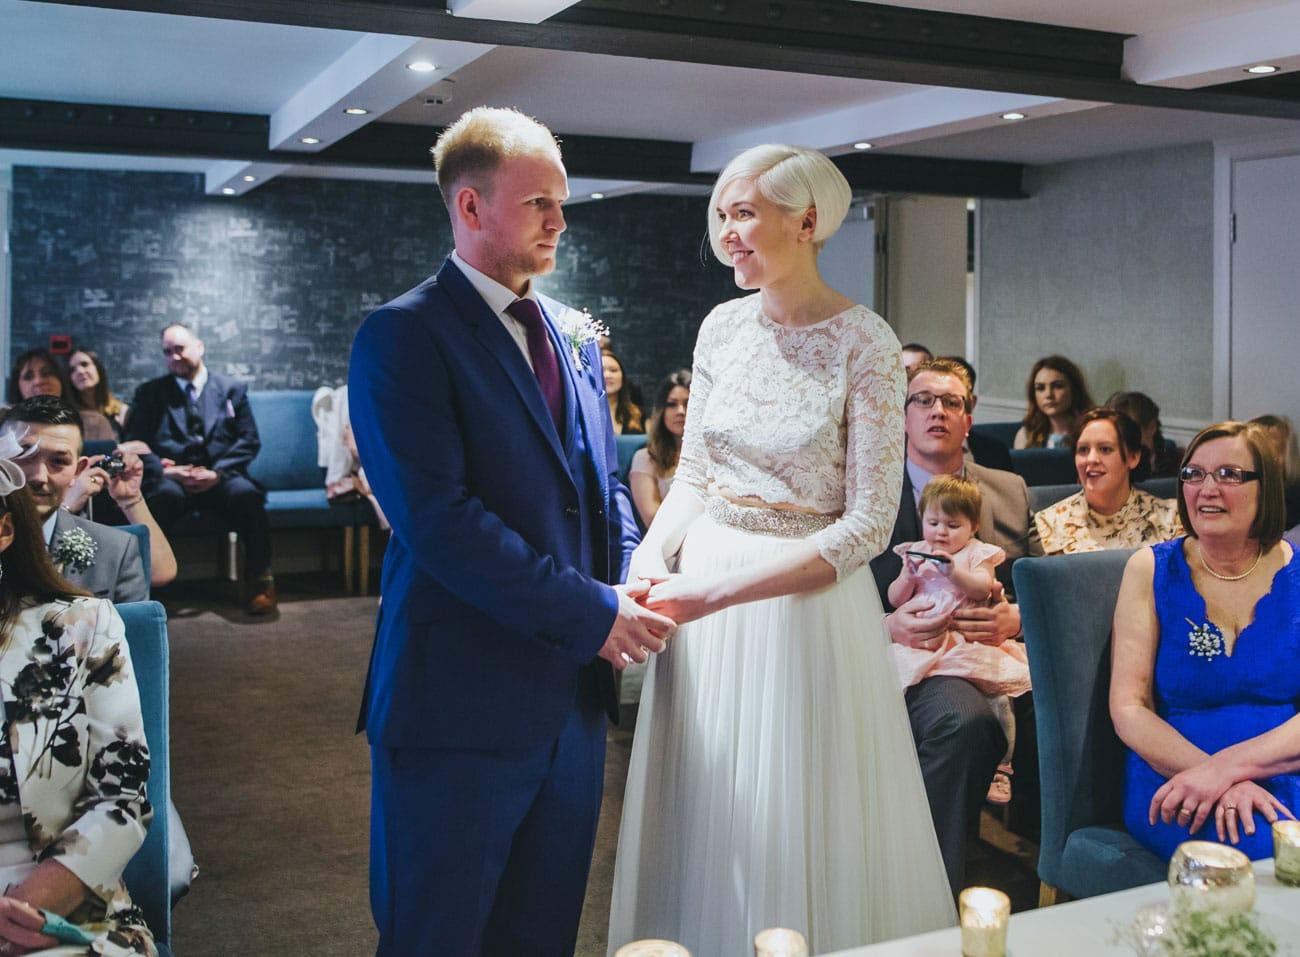 wedding ceremony at Great John Street hotel